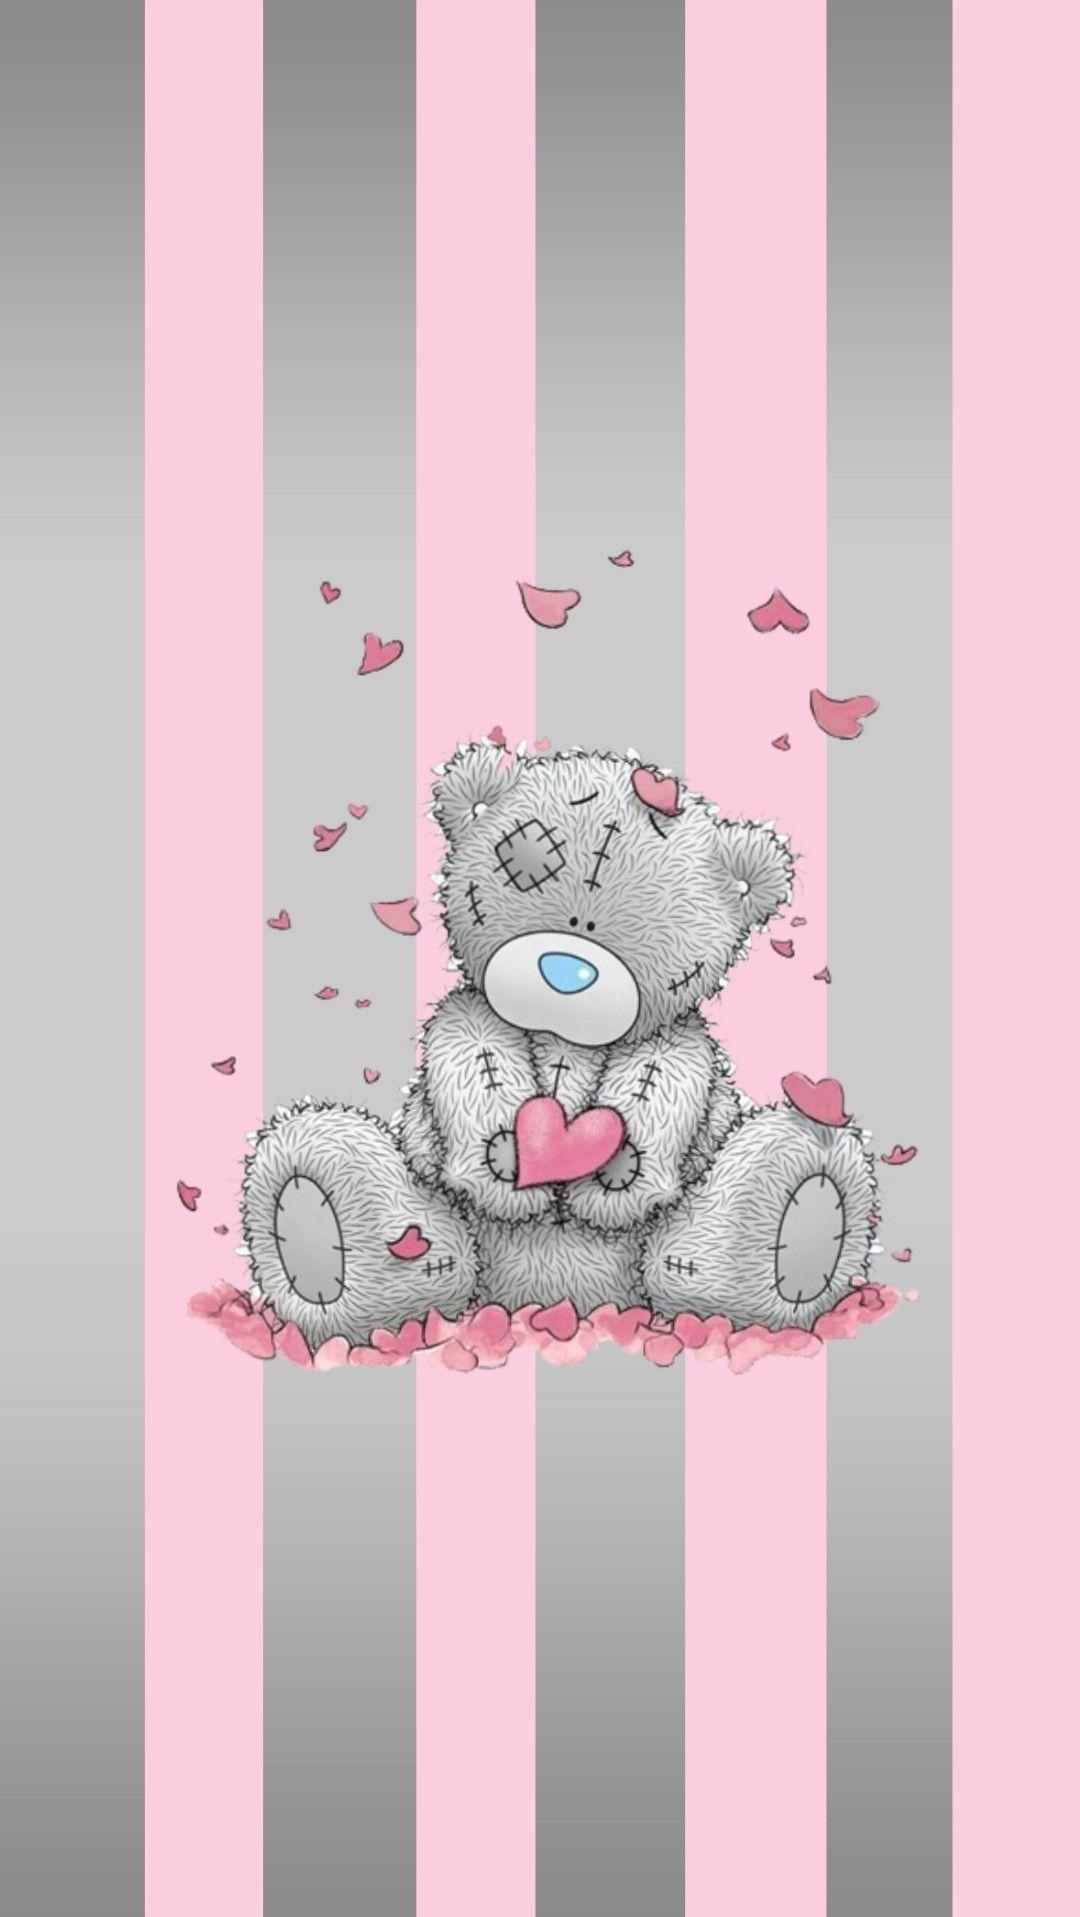 Pin By Nina On My Pink Corner Teddy Bear Wallpaper Bear Wallpaper Wallpaper Iphone Cute